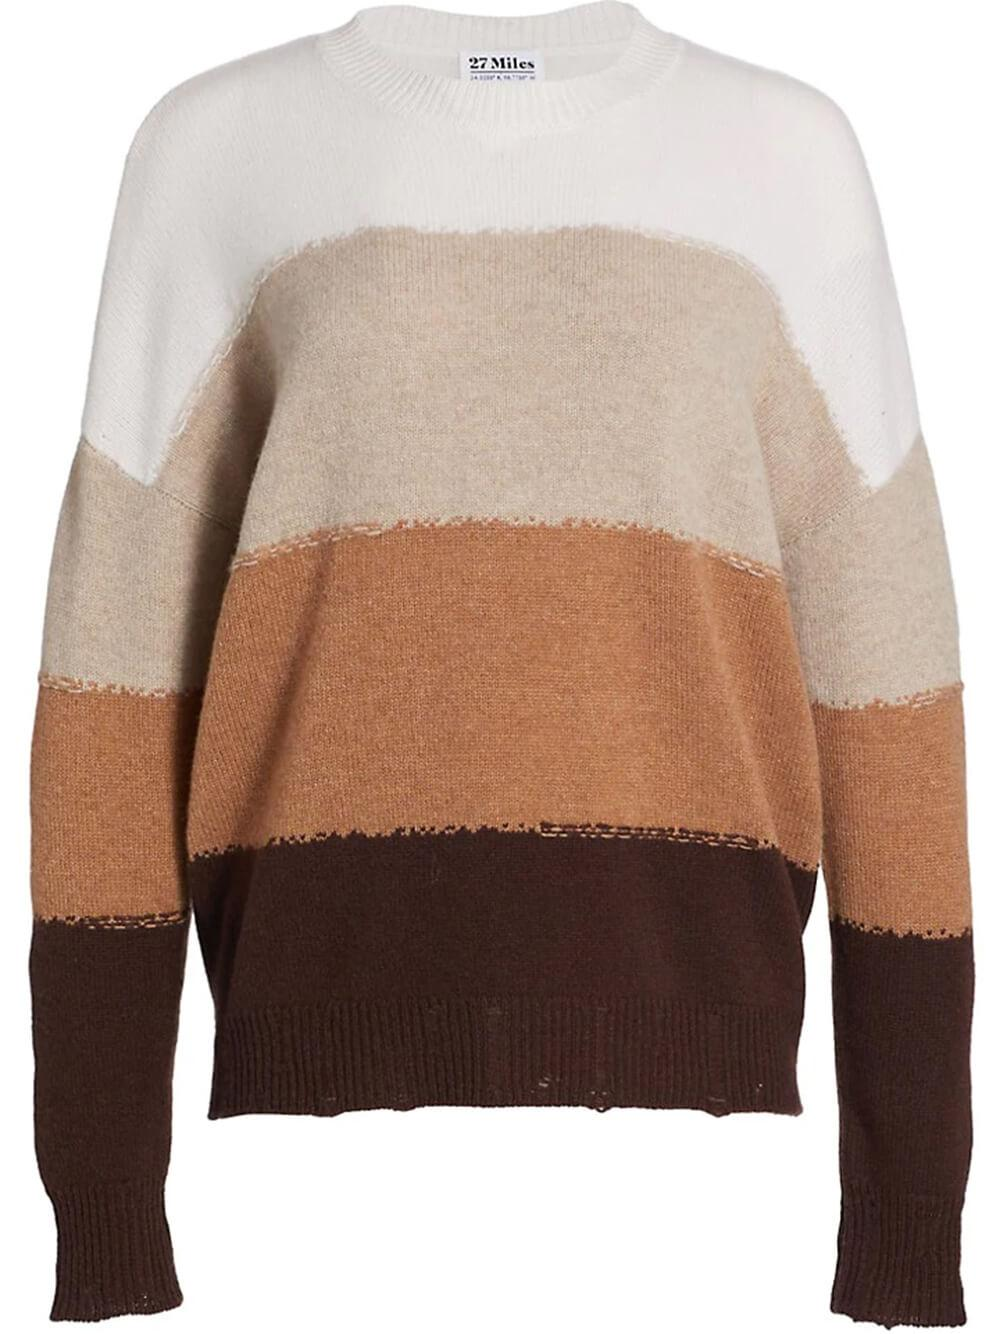 Alondra Block Stripe Pullover Item # ALONDRA